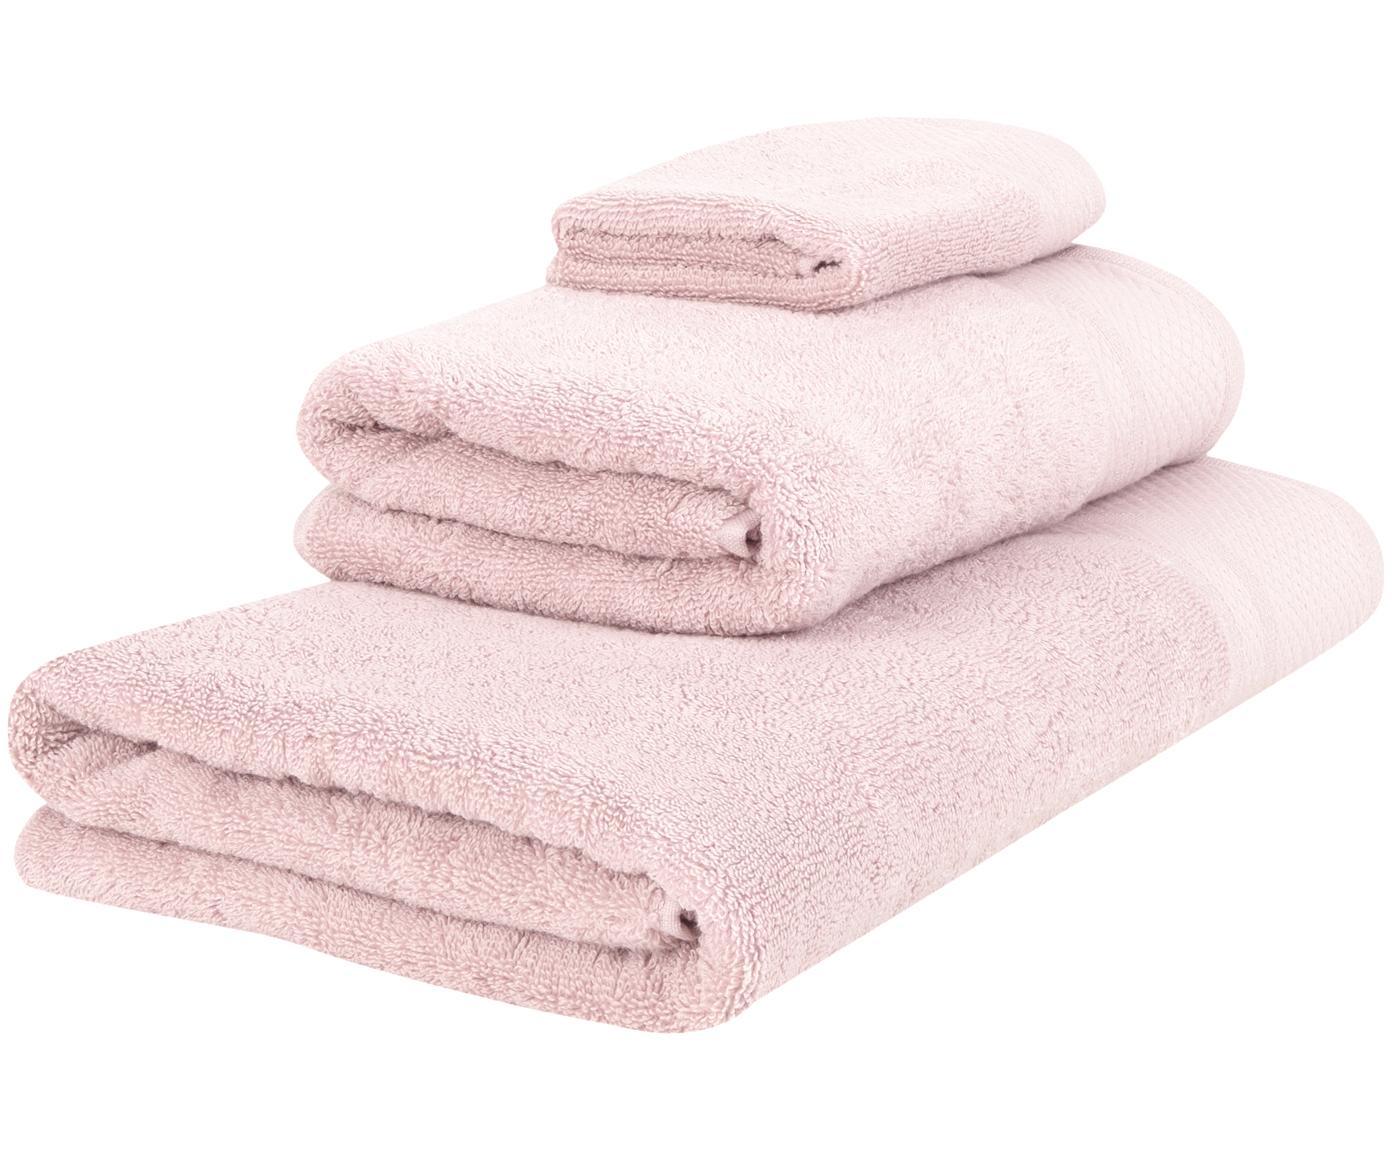 Set asciugamani Premium 3 pz, Rosa cipria, Diverse dimensioni